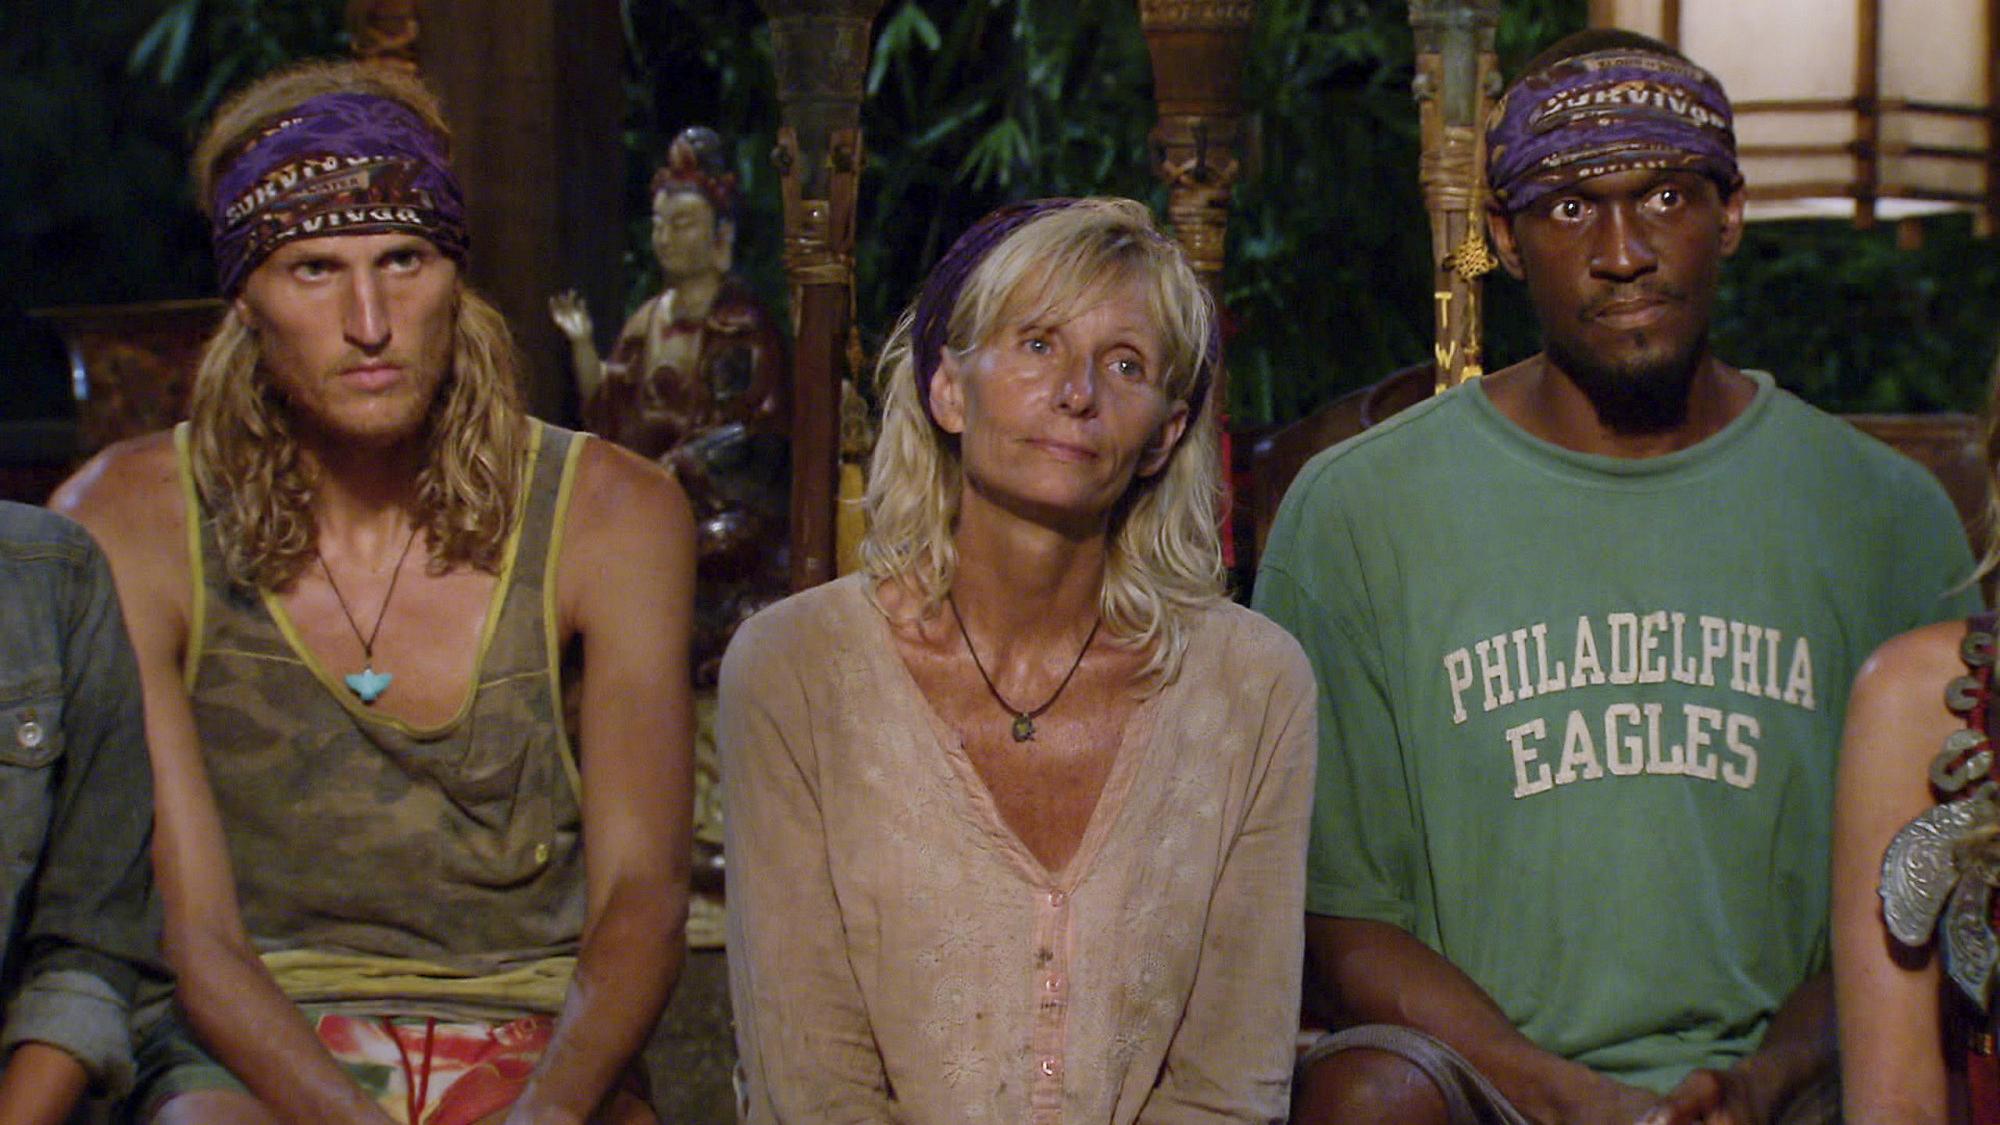 Tyson, Tina and Gervase